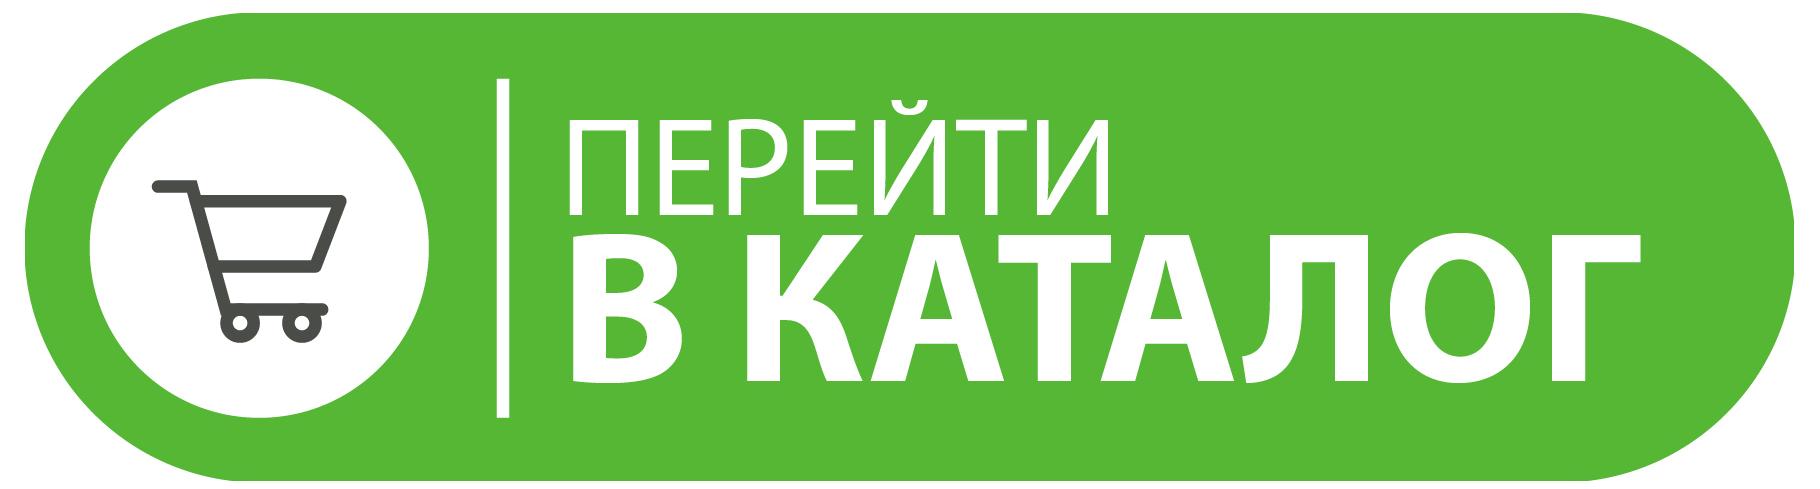 katalog-wspitaly